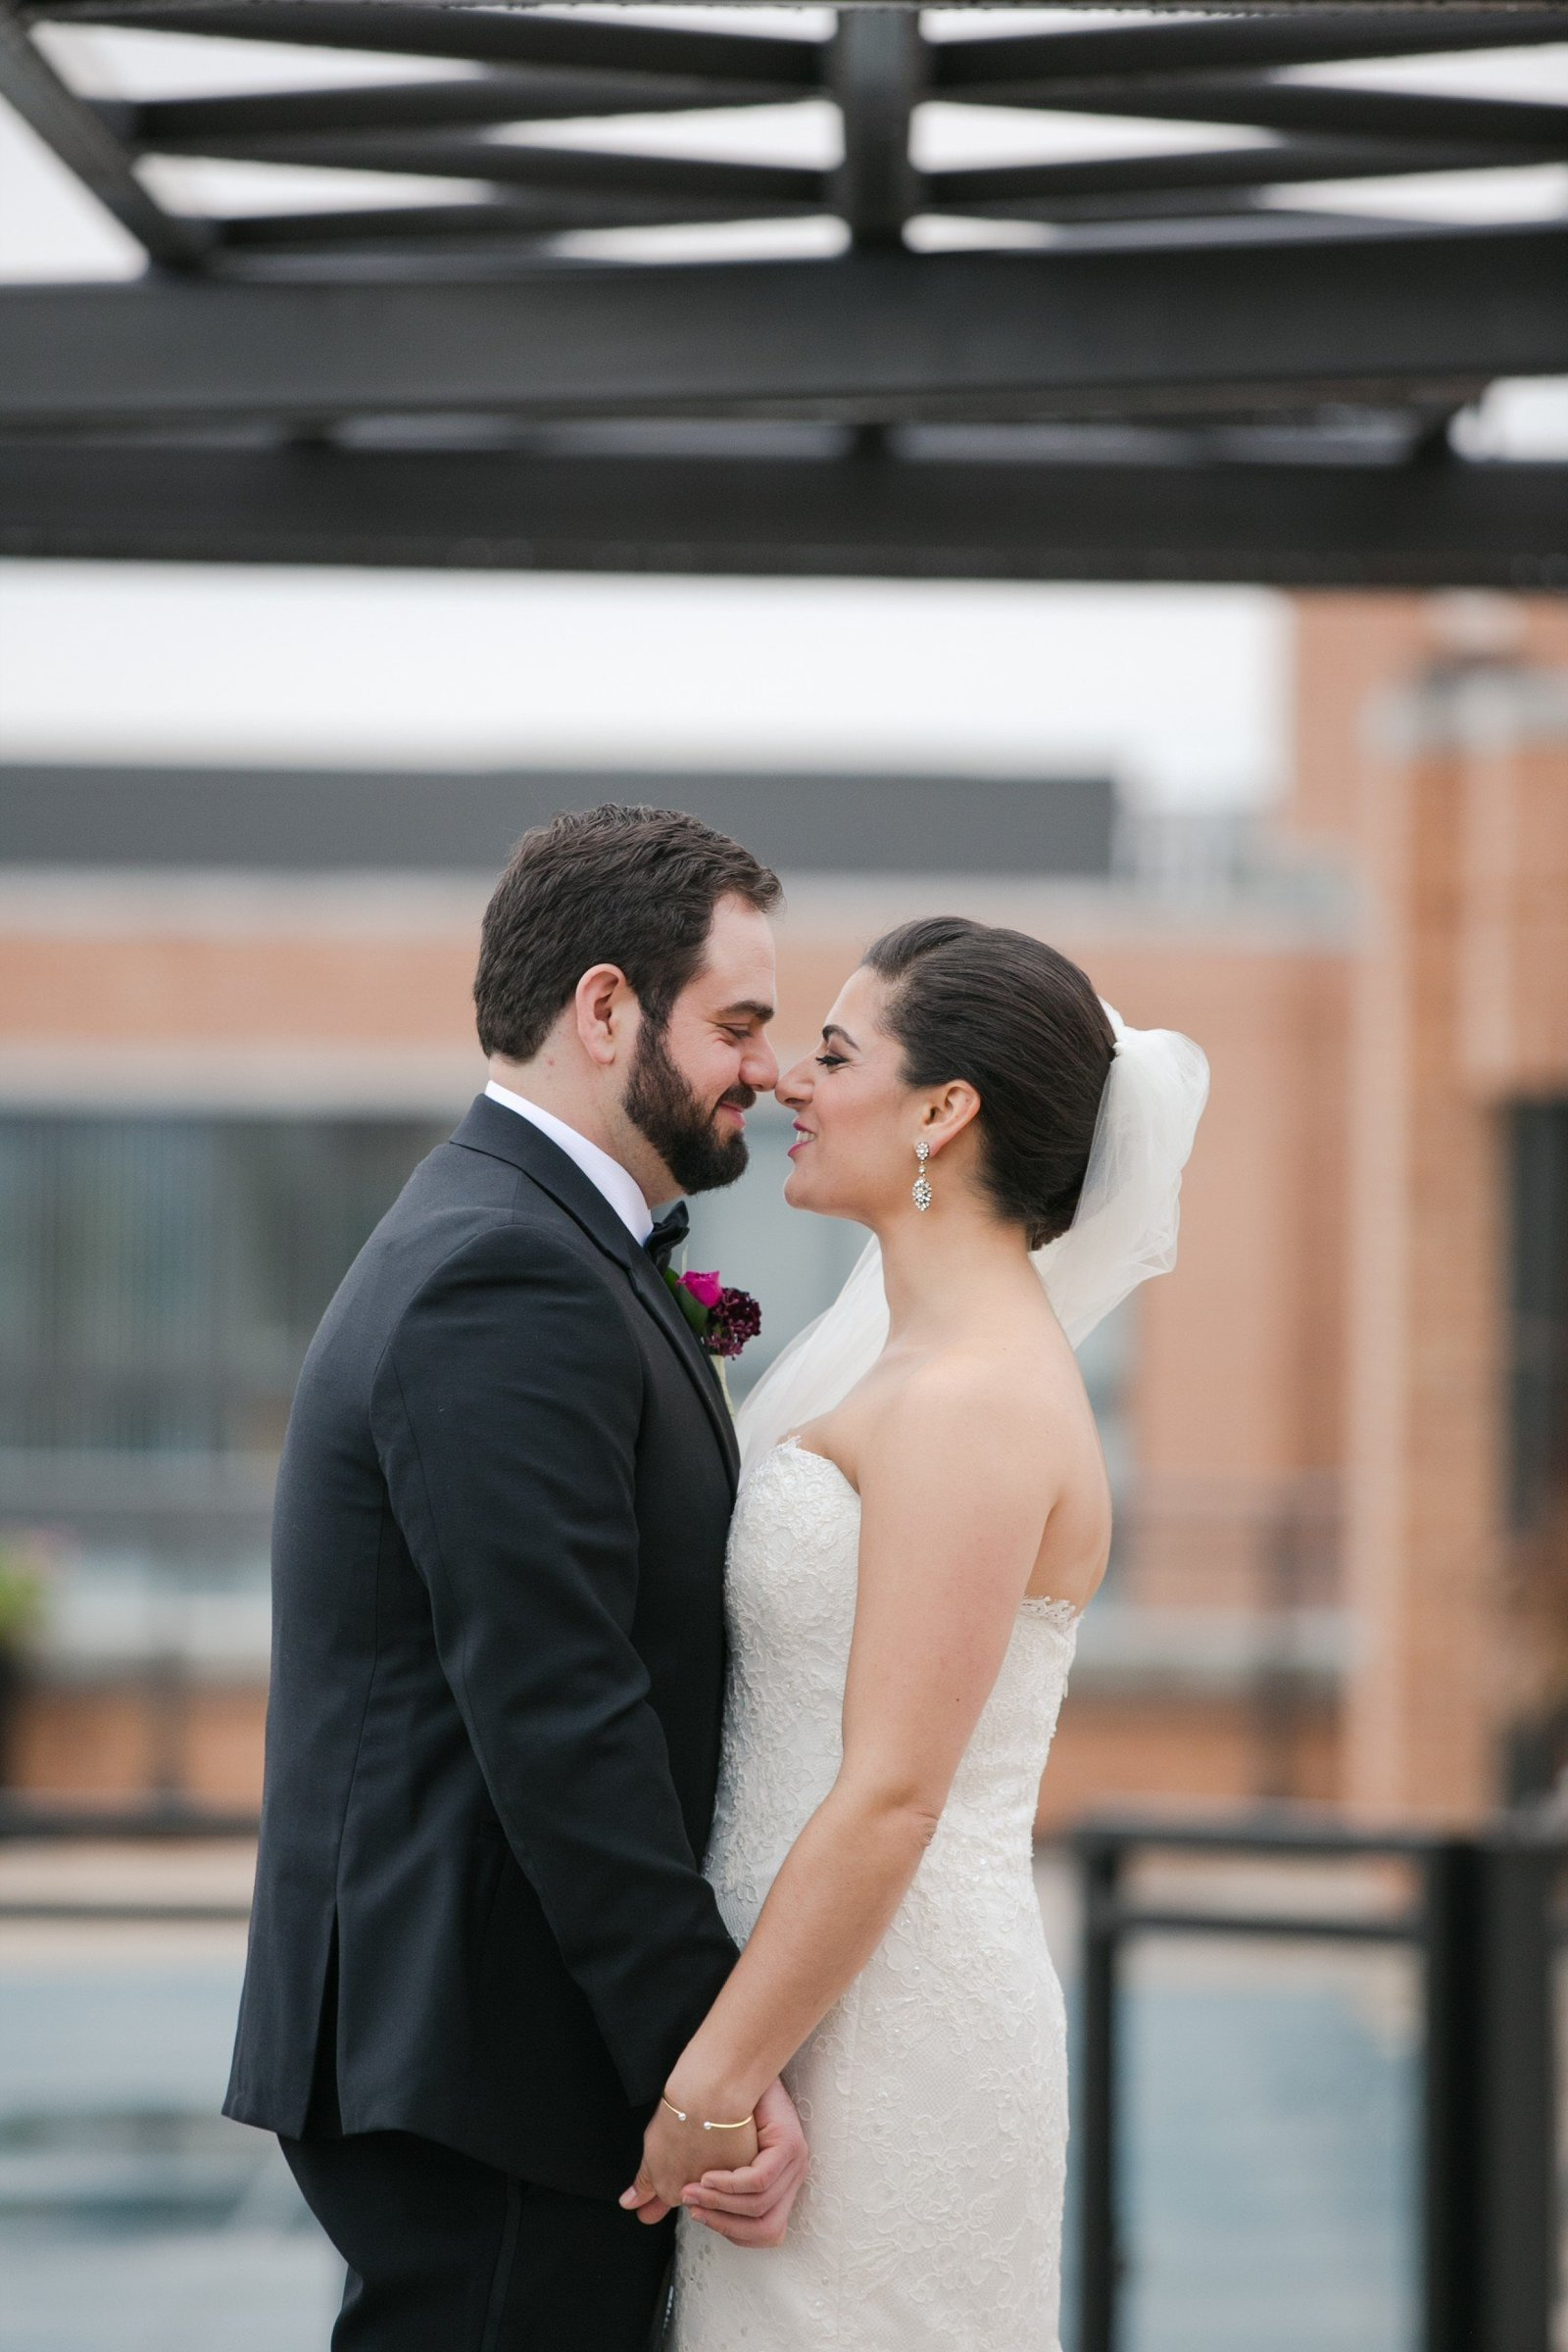 Black-tie-wedding-photos-longview-gallery-dc (141)